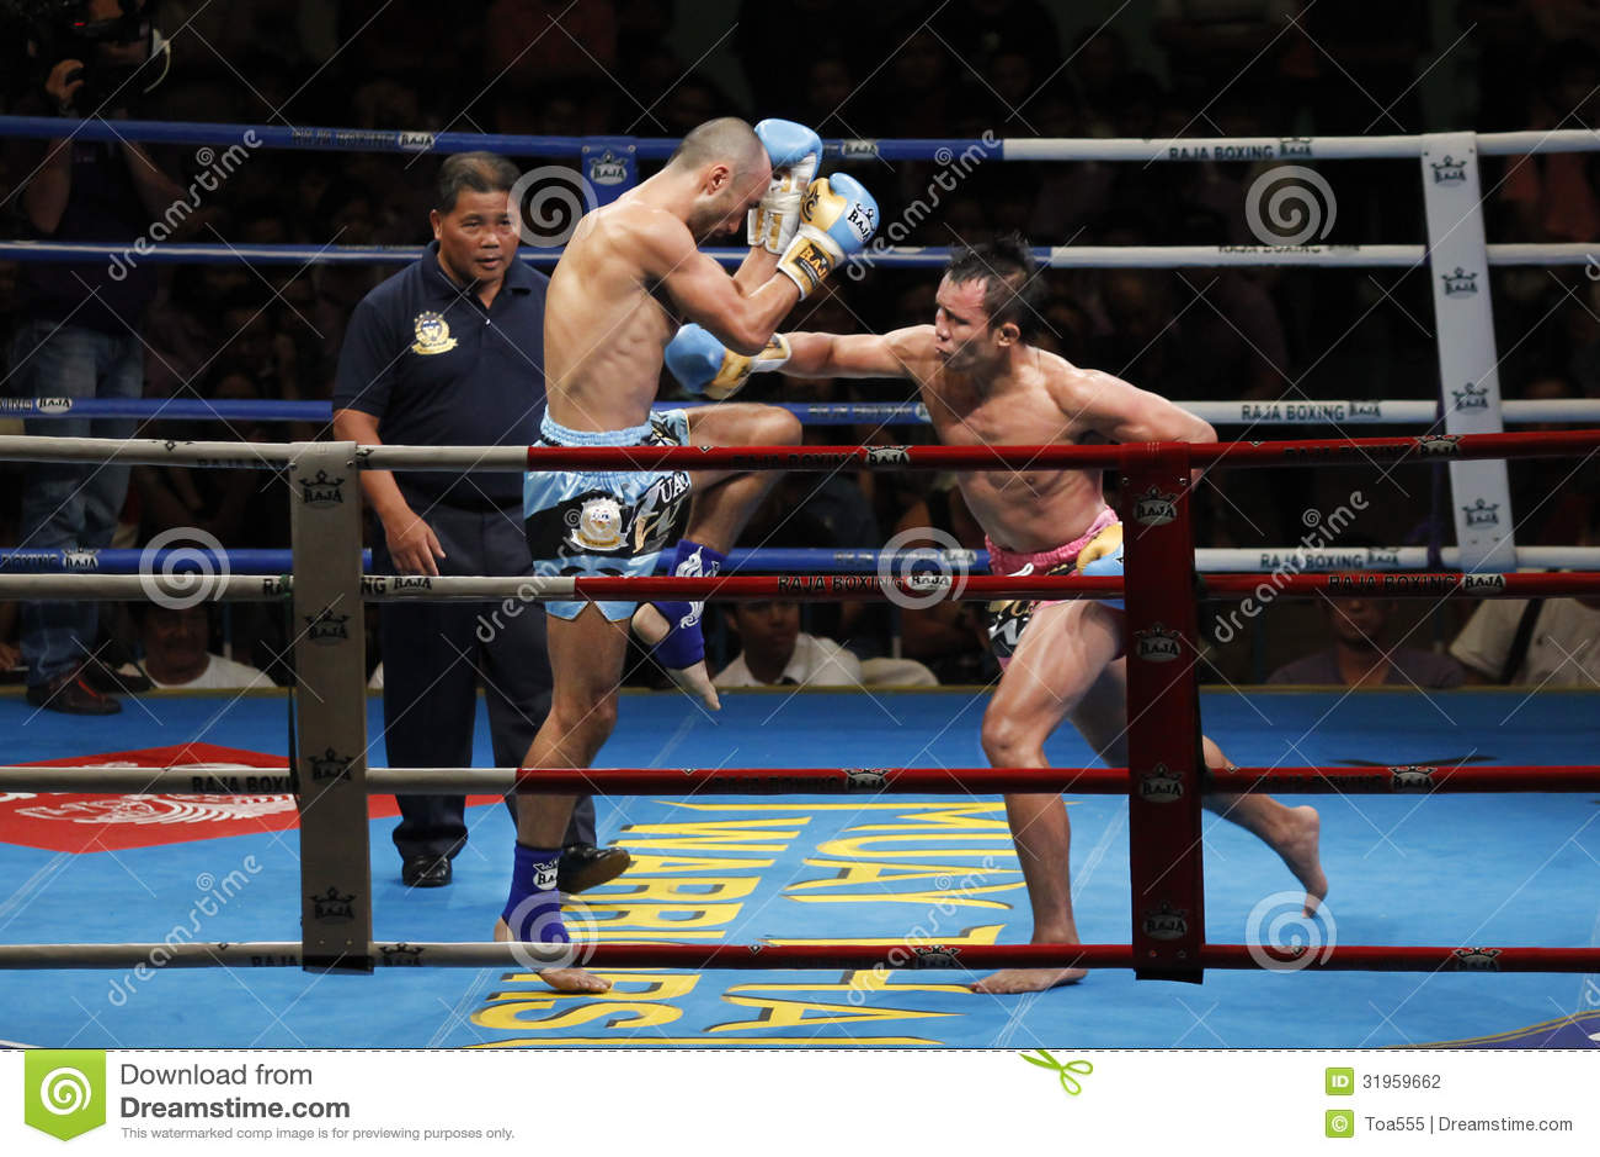 Thai Boxing or Muay Thai